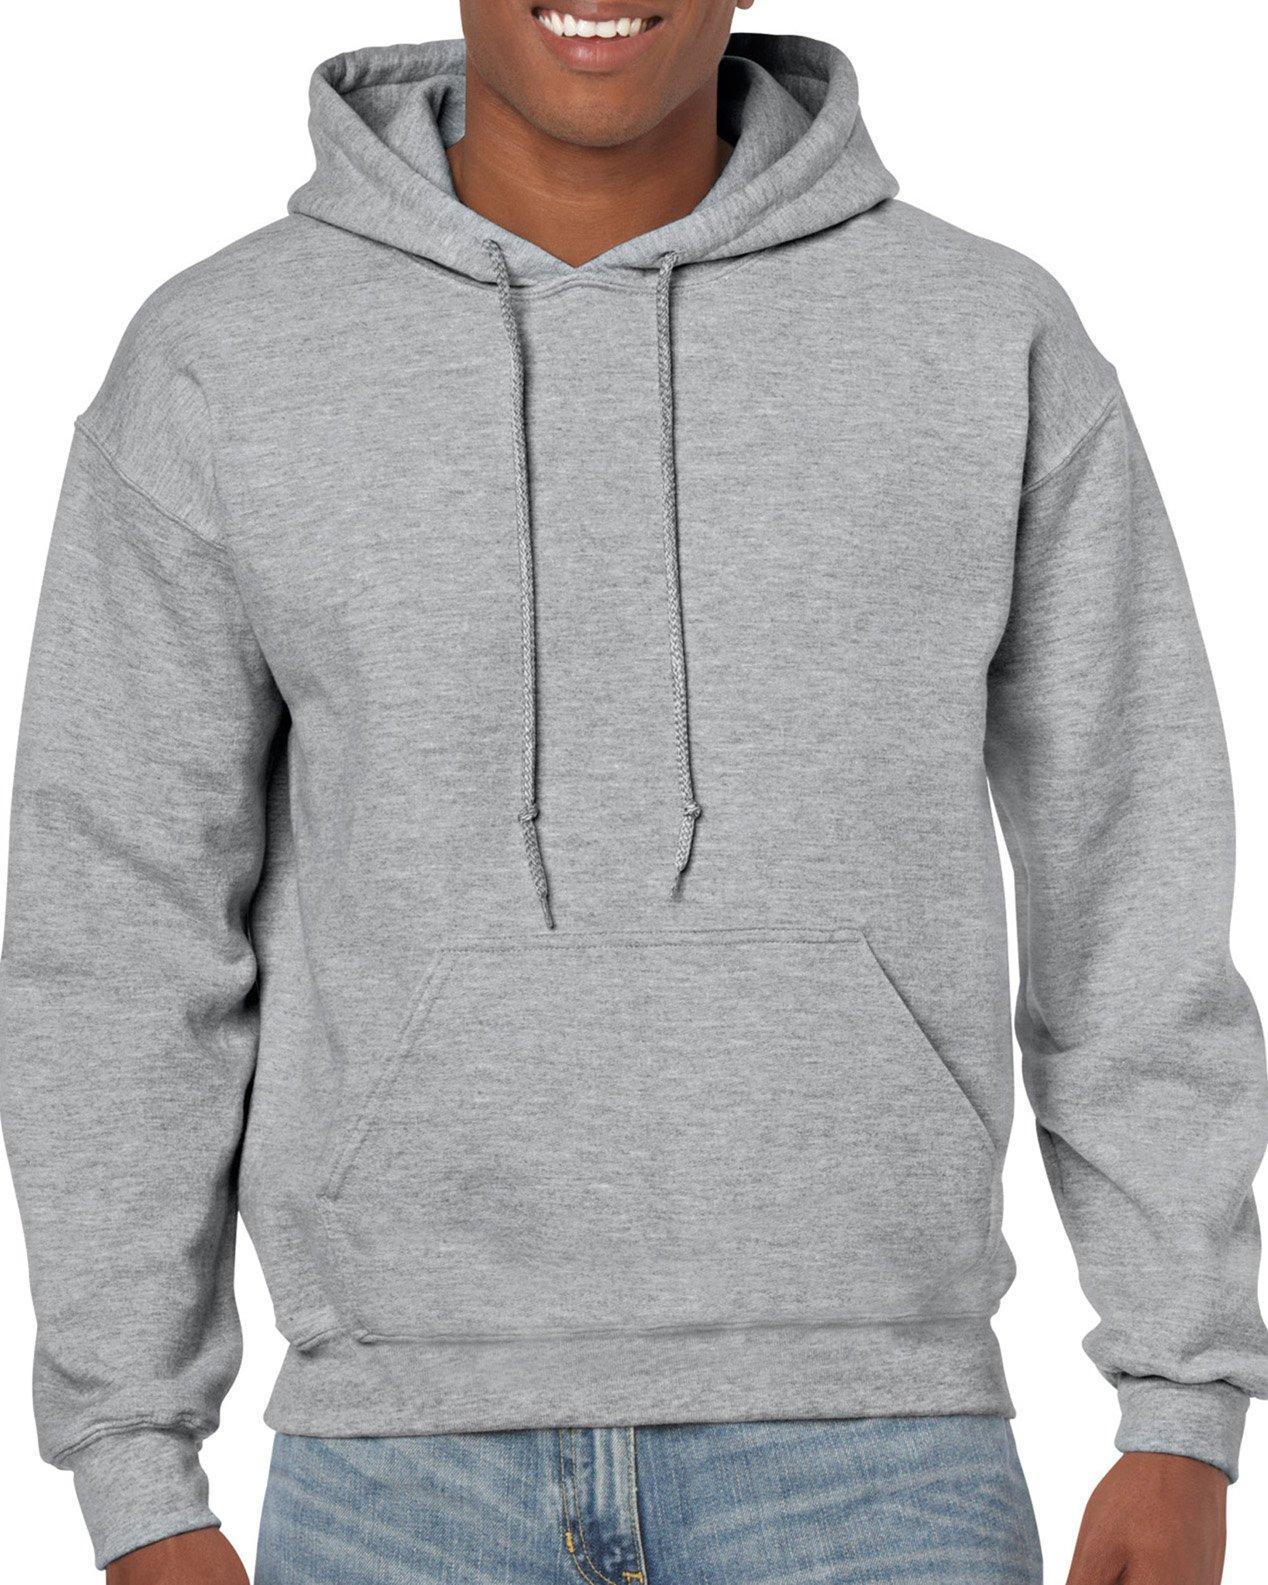 Gildan G18500 Heavy Blend Adult Unisex Hooded Sweatshirt M 1 Black 1 Orange